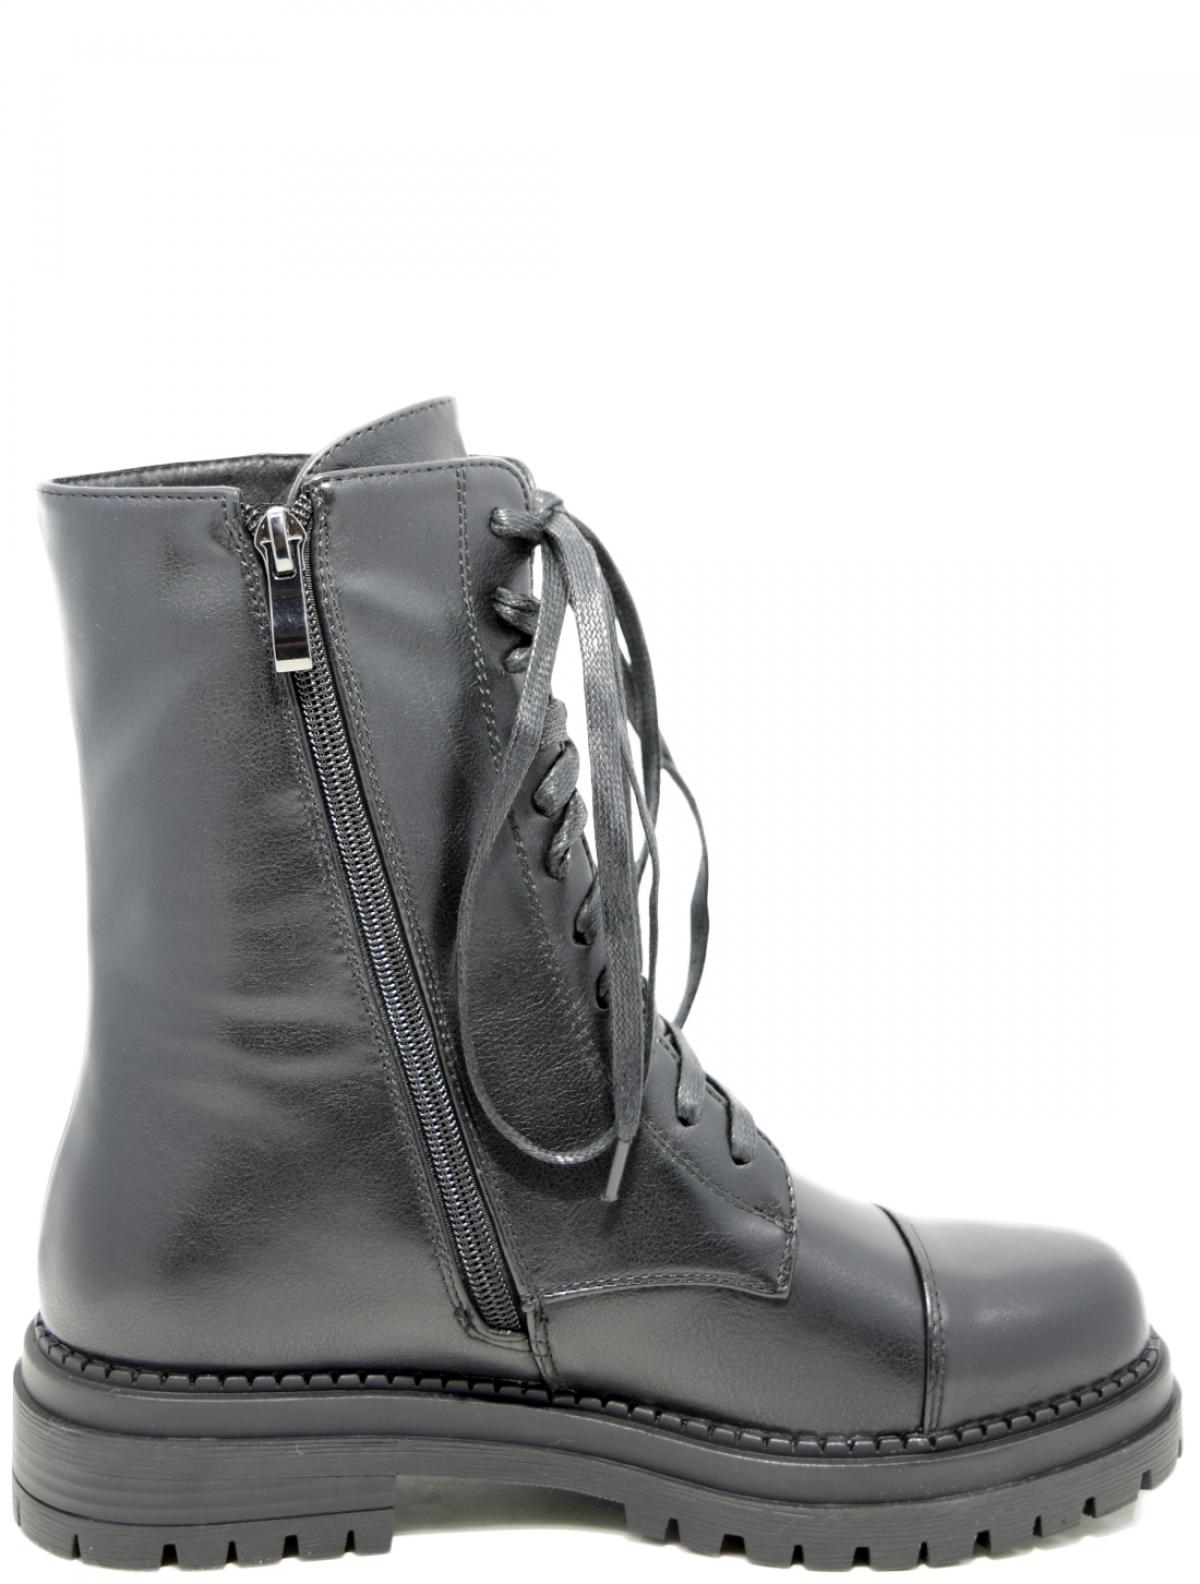 Admlis 9910 женские ботинки